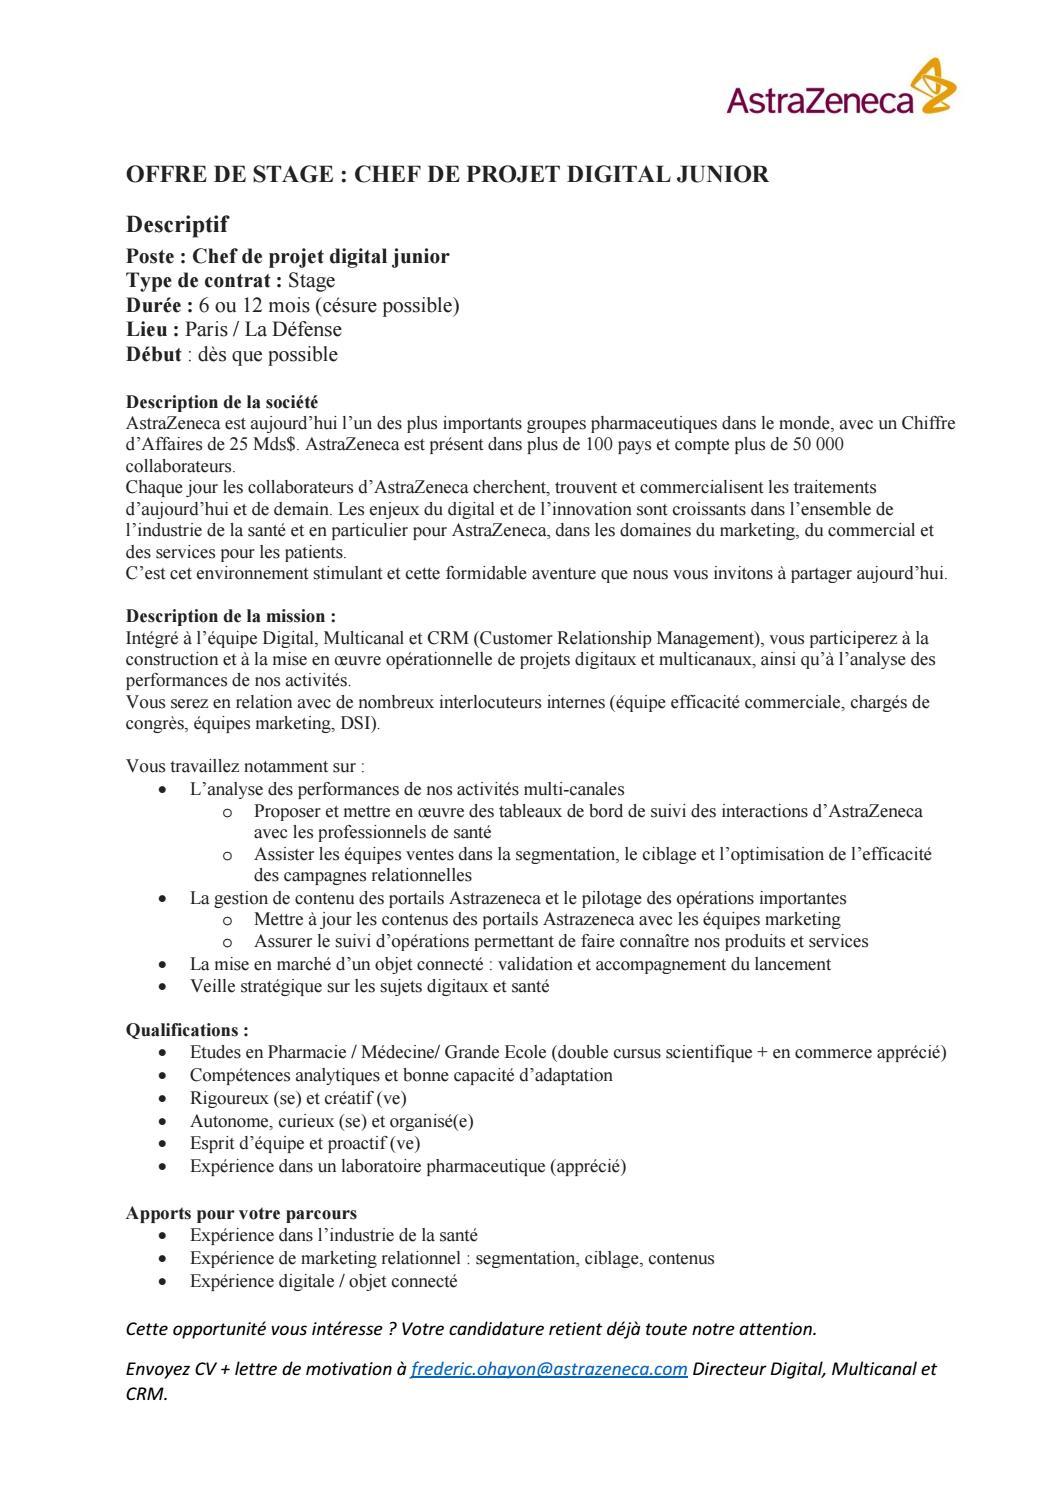 Offre De Stage Chef De Projet Digital Junior Astrazeneca By